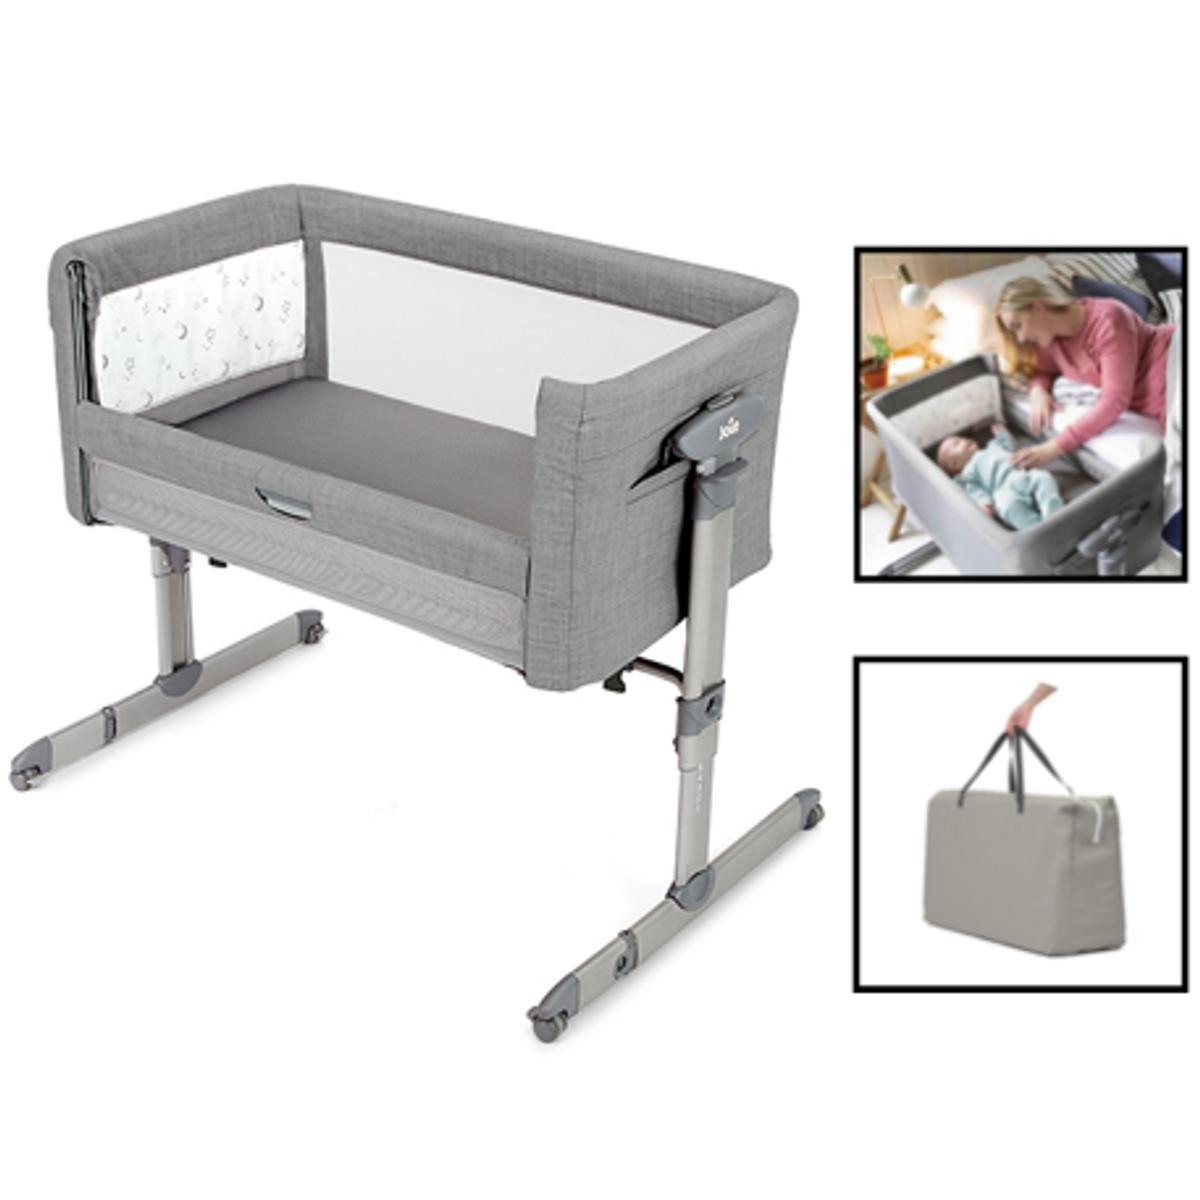 Joie   Roomie Glide   Bedside Crib   Grey